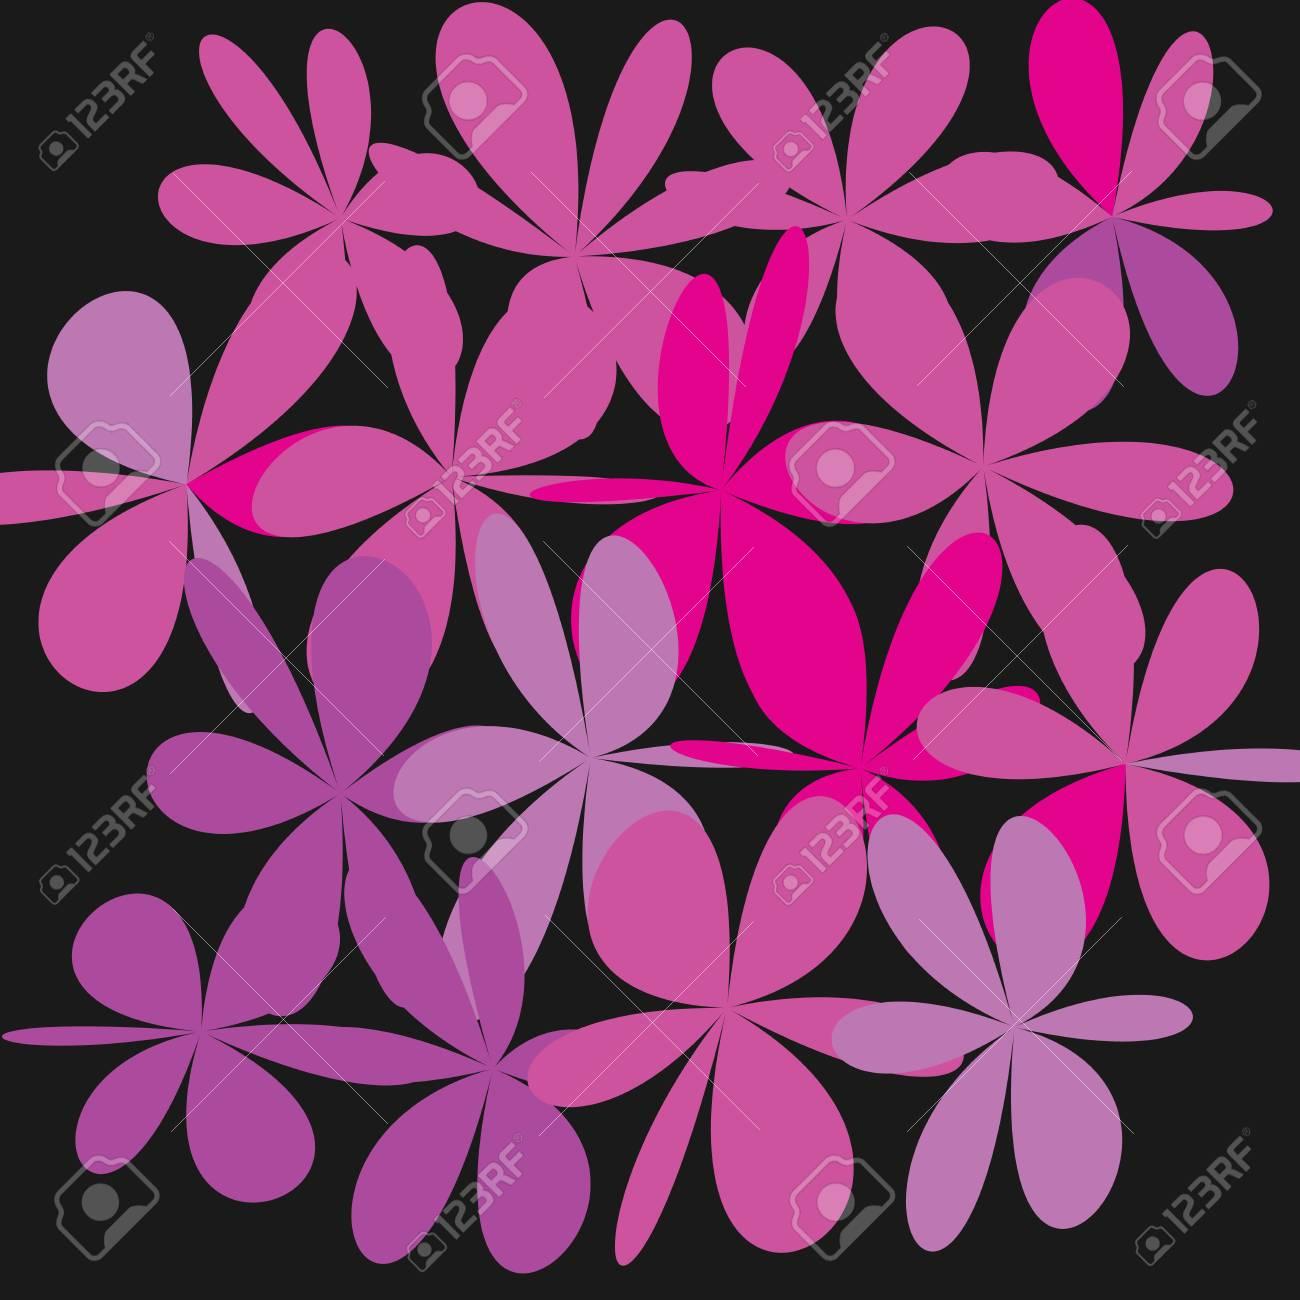 Whimsical Floral Background Pink Flower On Black Background